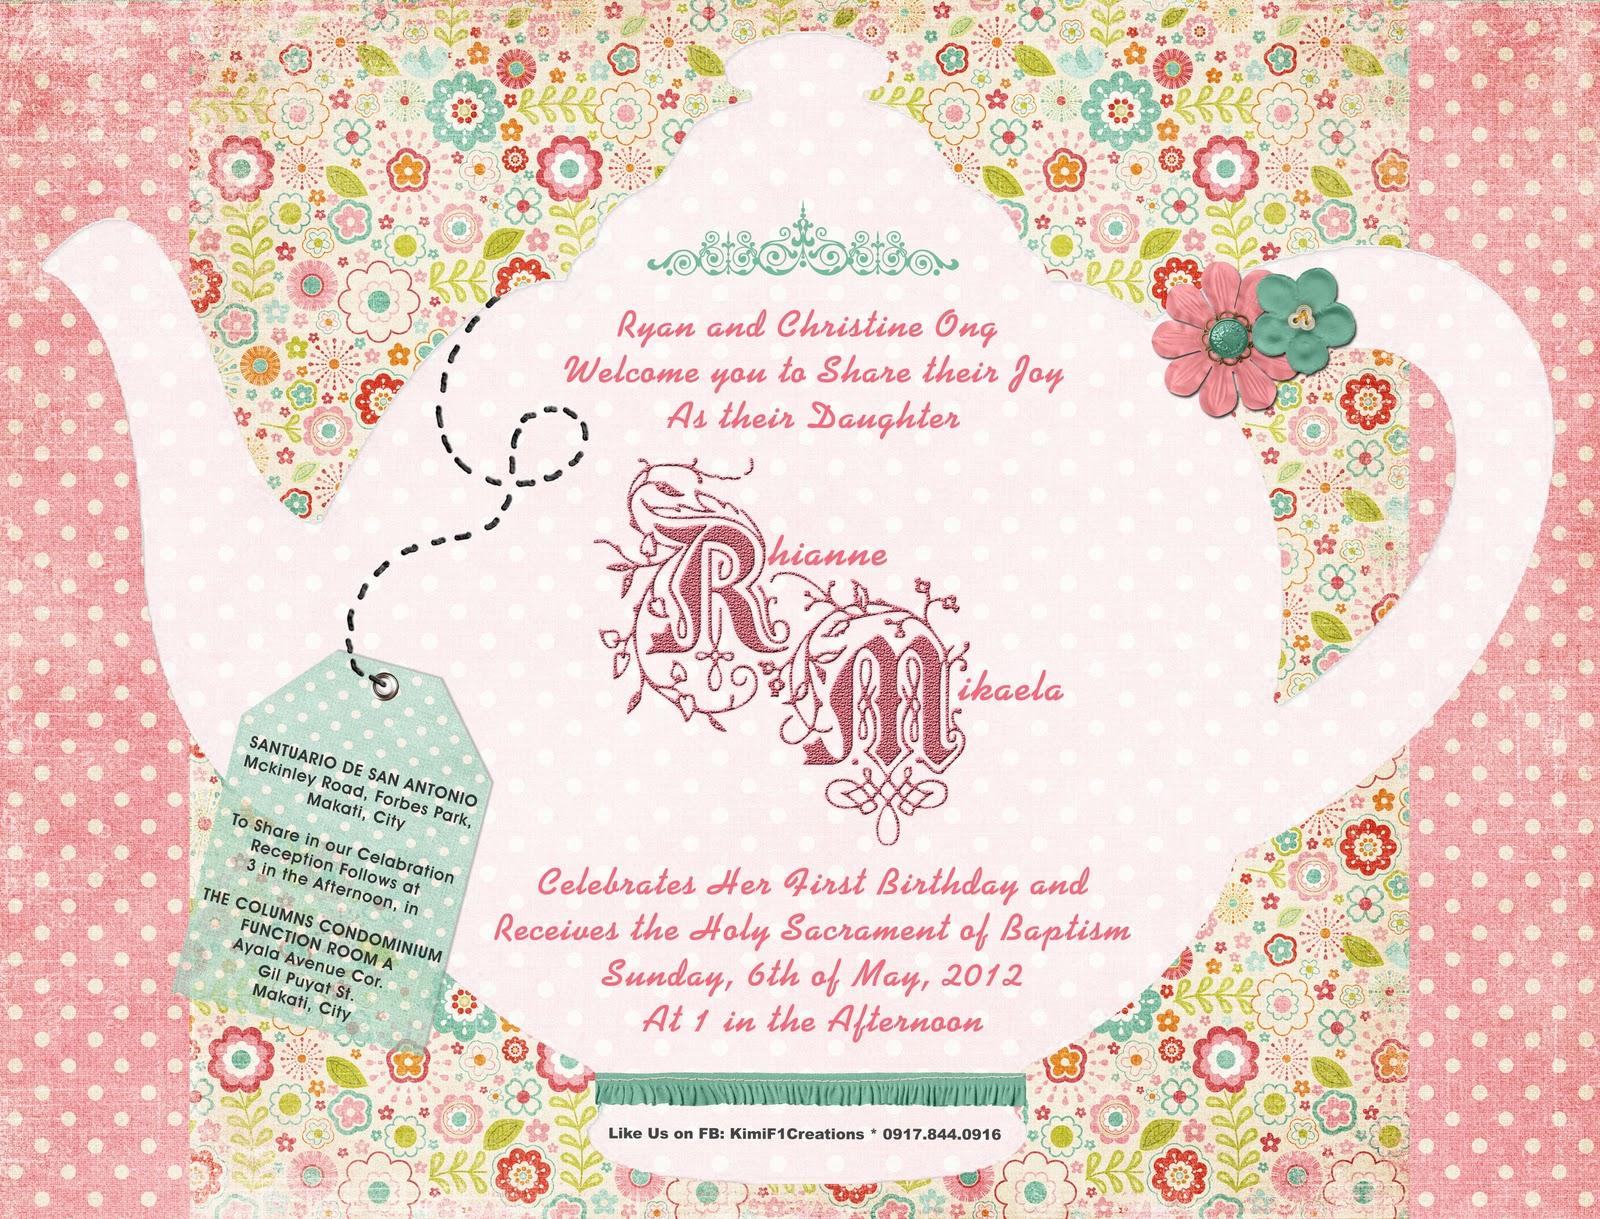 Watch more like Church Tea Party Invitation – Afternoon Tea Party Invitation